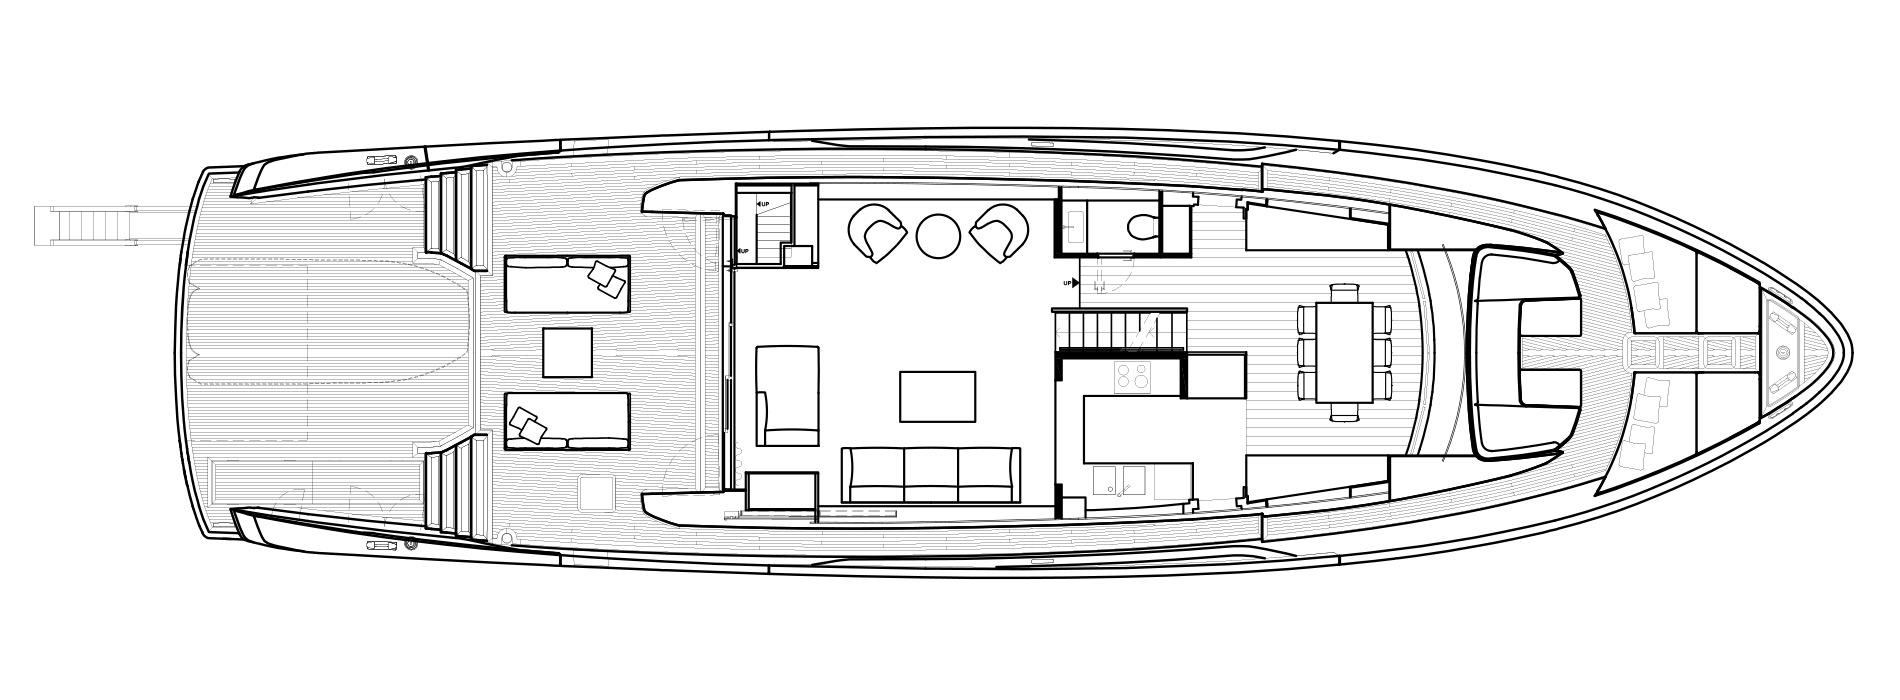 Sanlorenzo Yachts SX88 Main deck Version A Open Galley